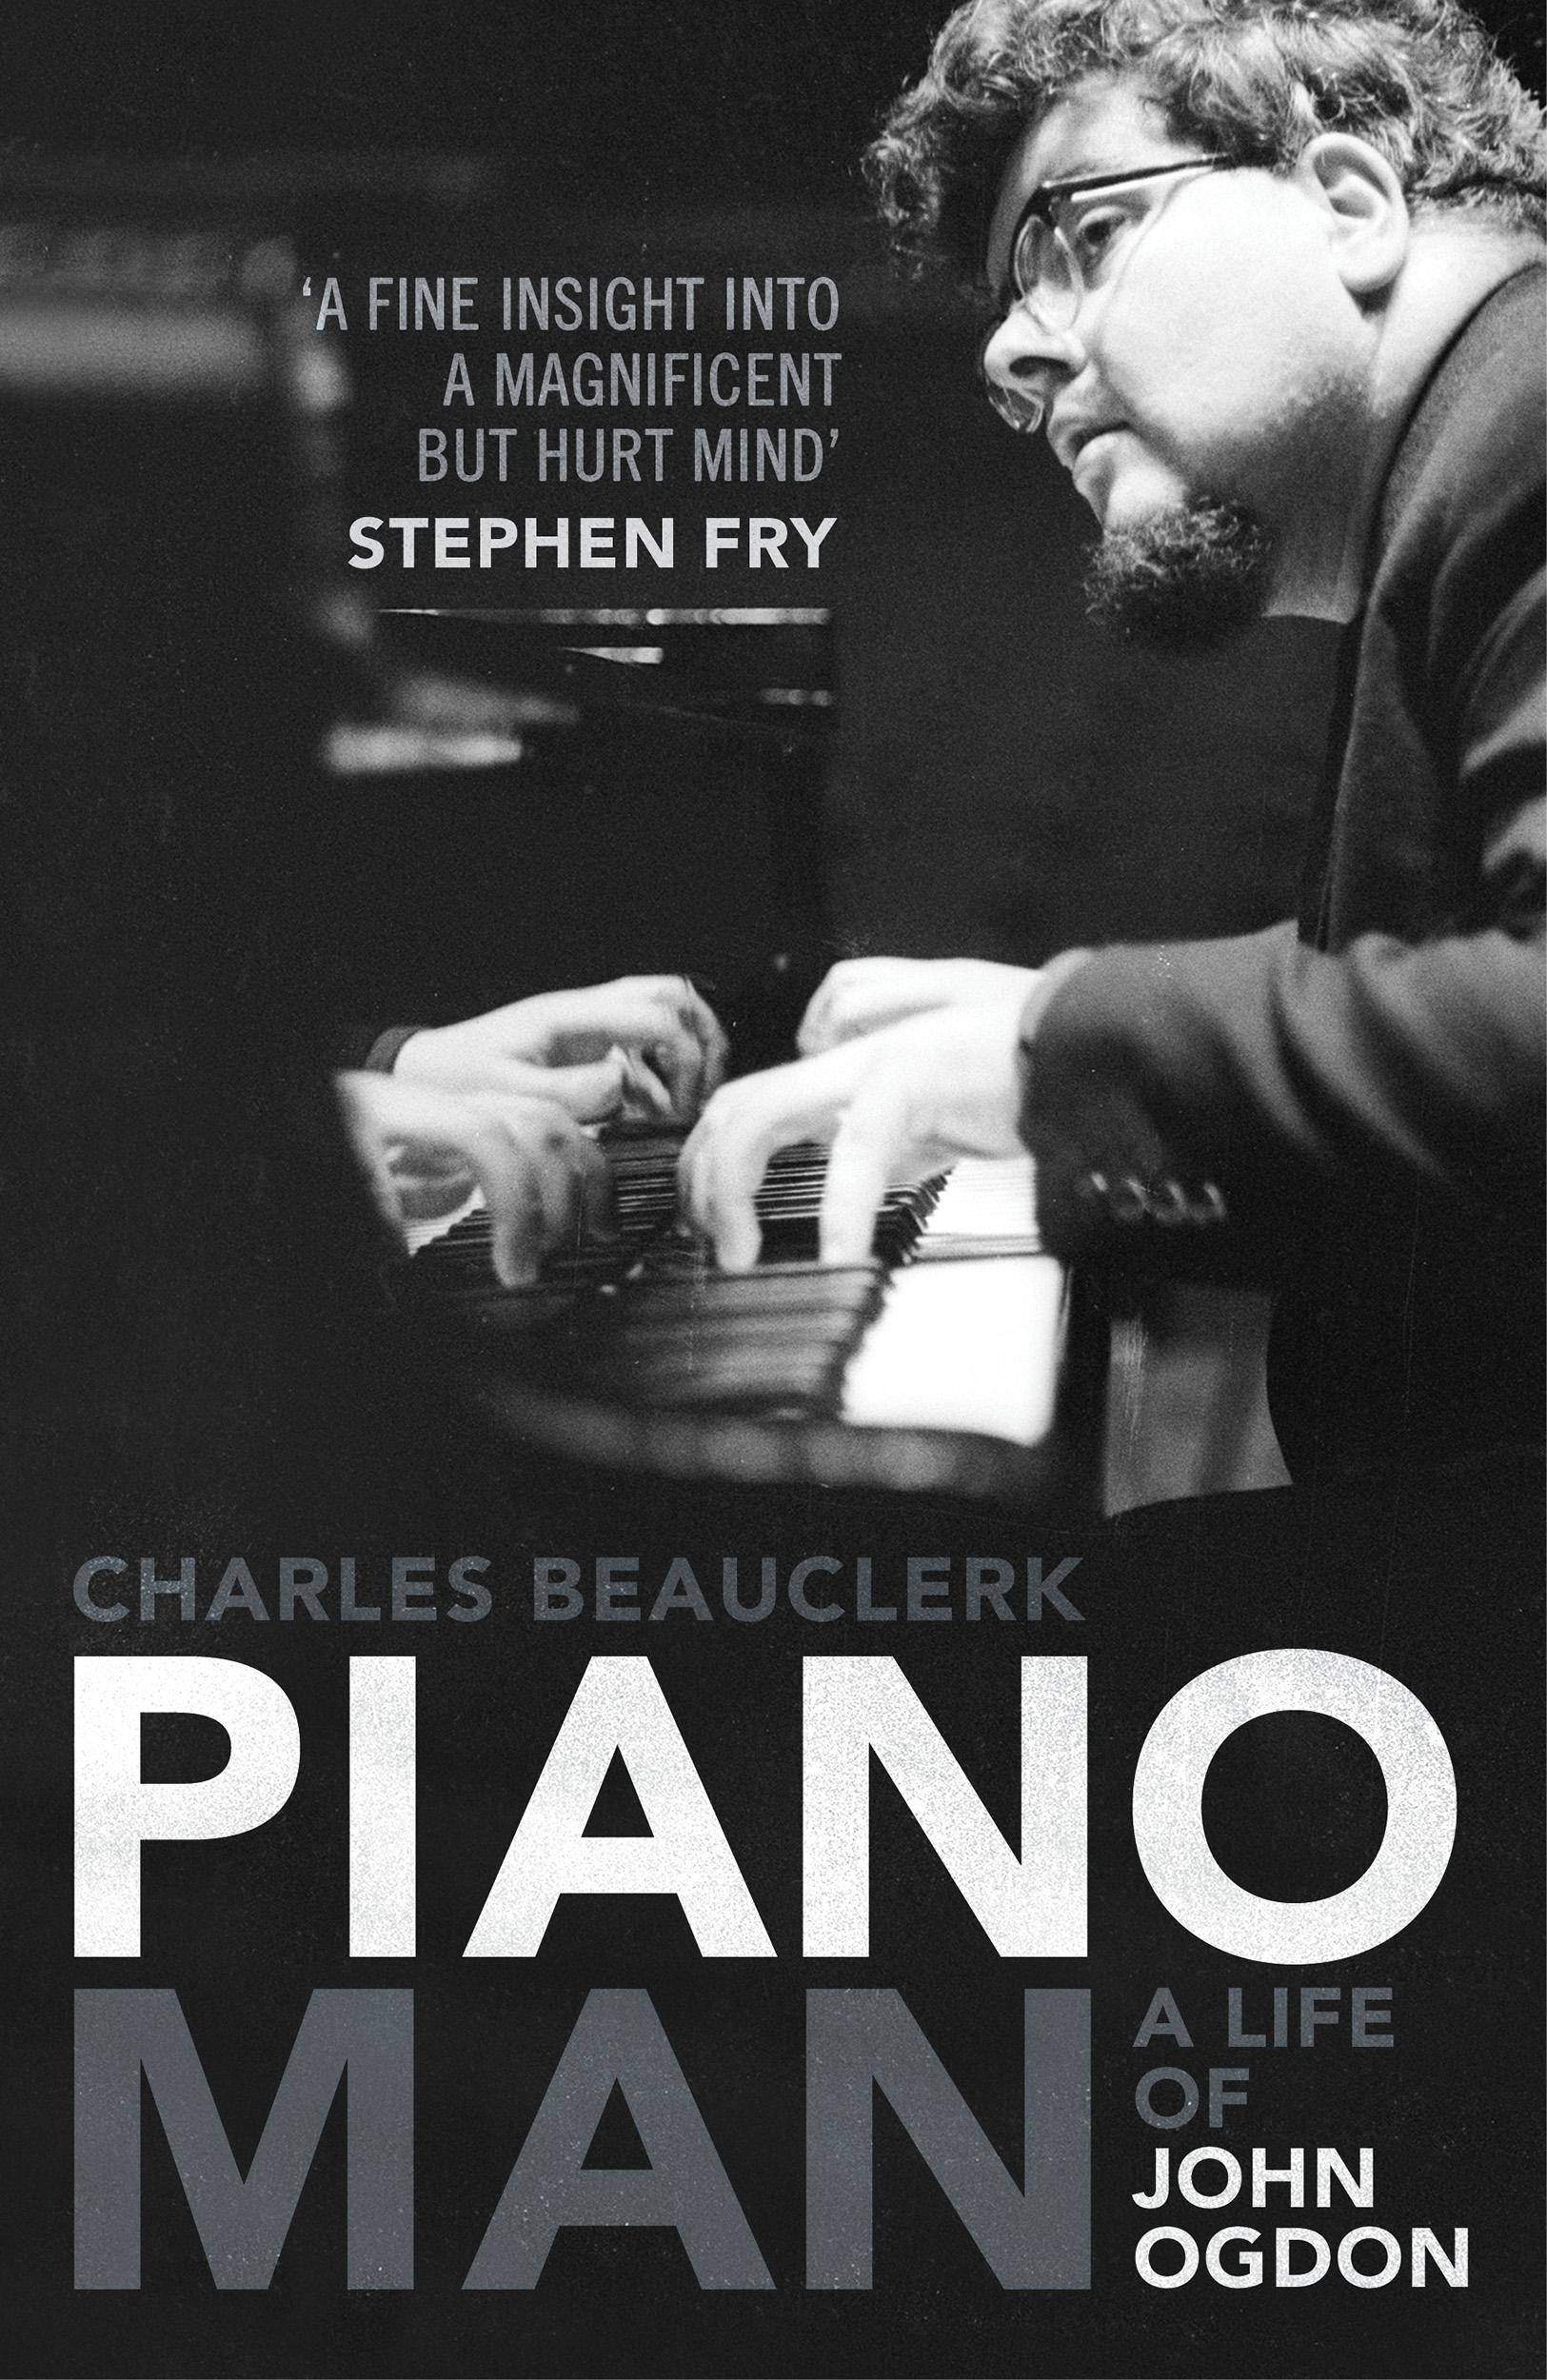 Piano man 9780857200112 hr